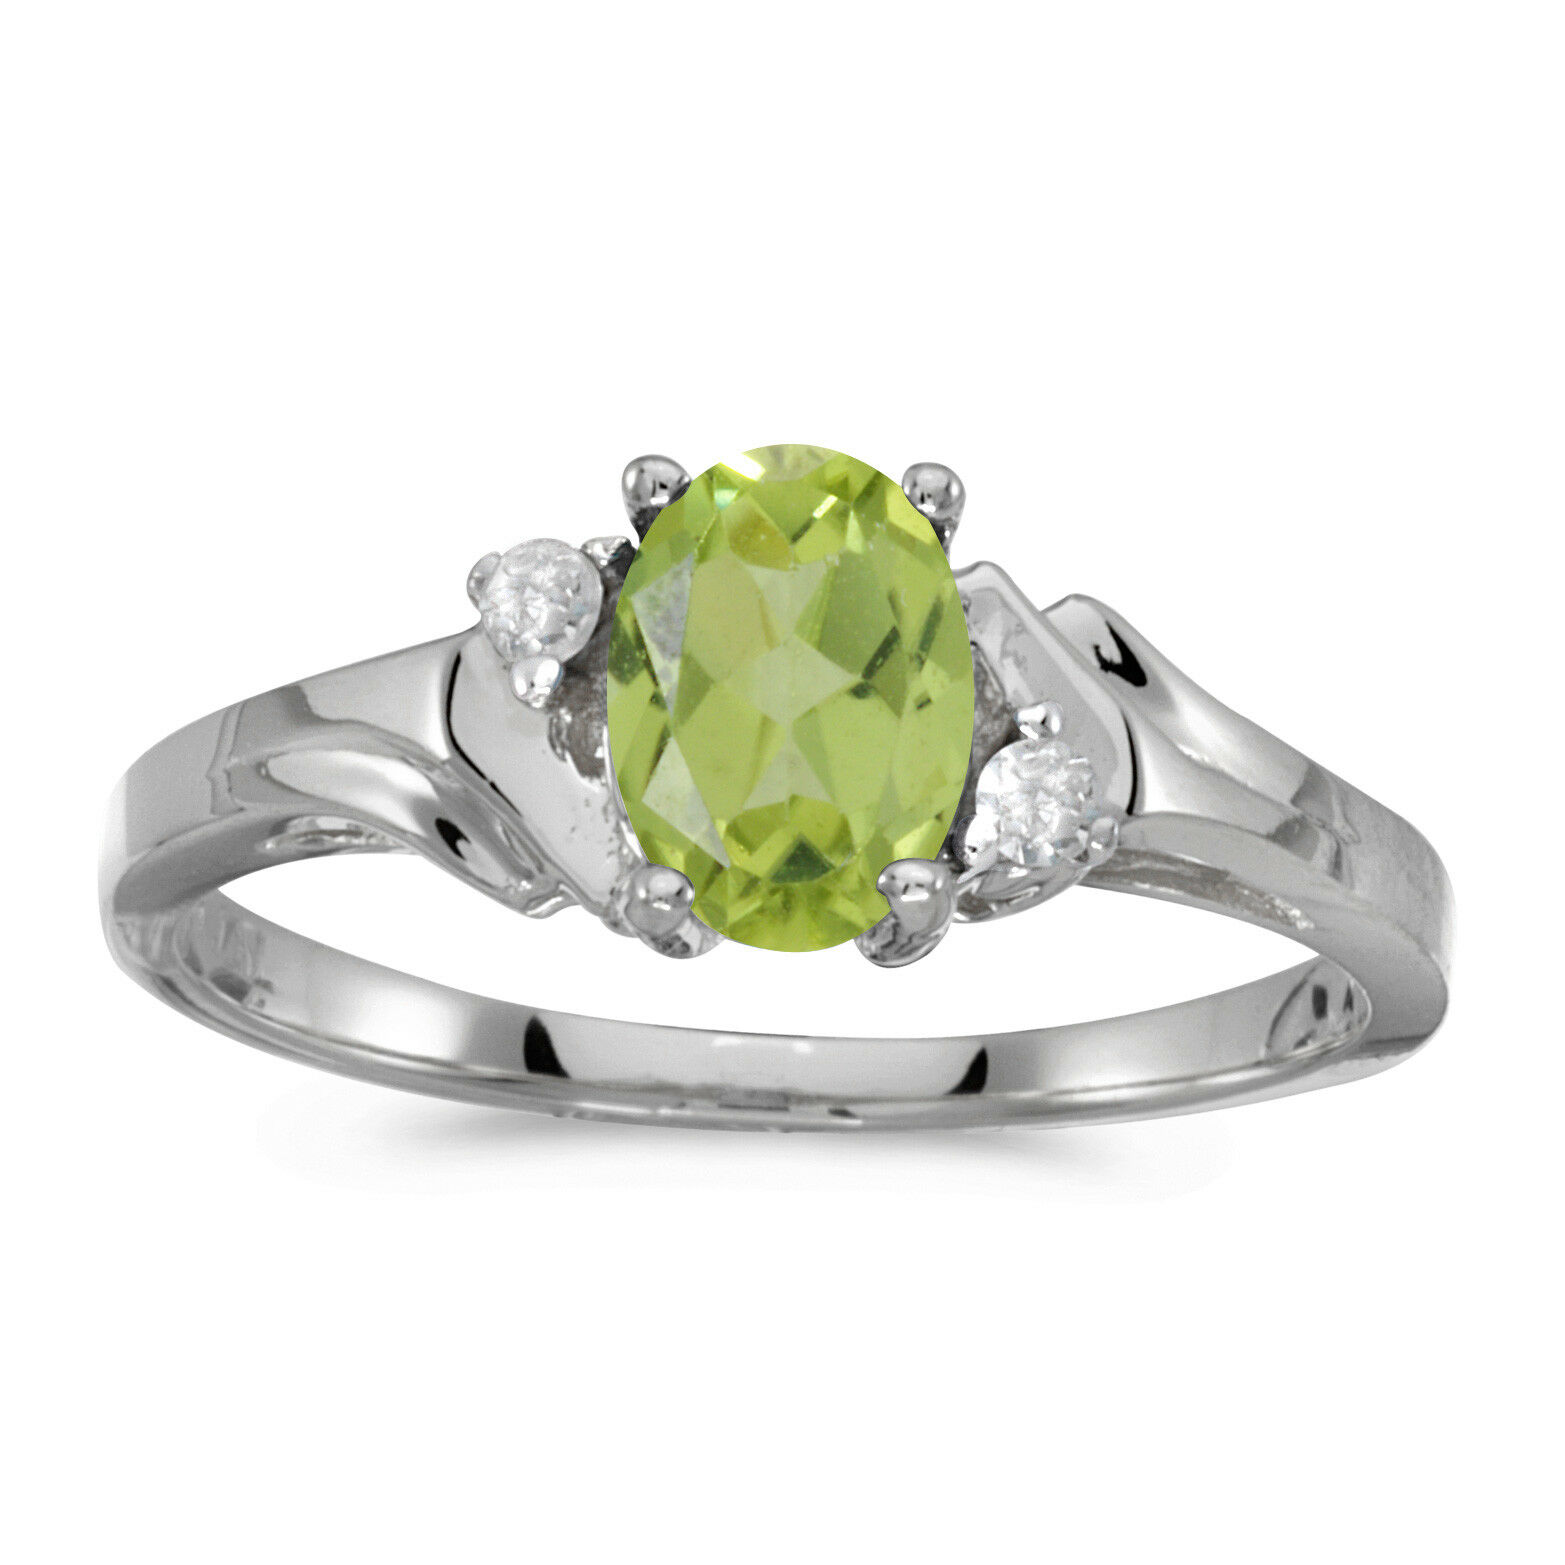 14k White gold Oval Peridot And Diamond Ring